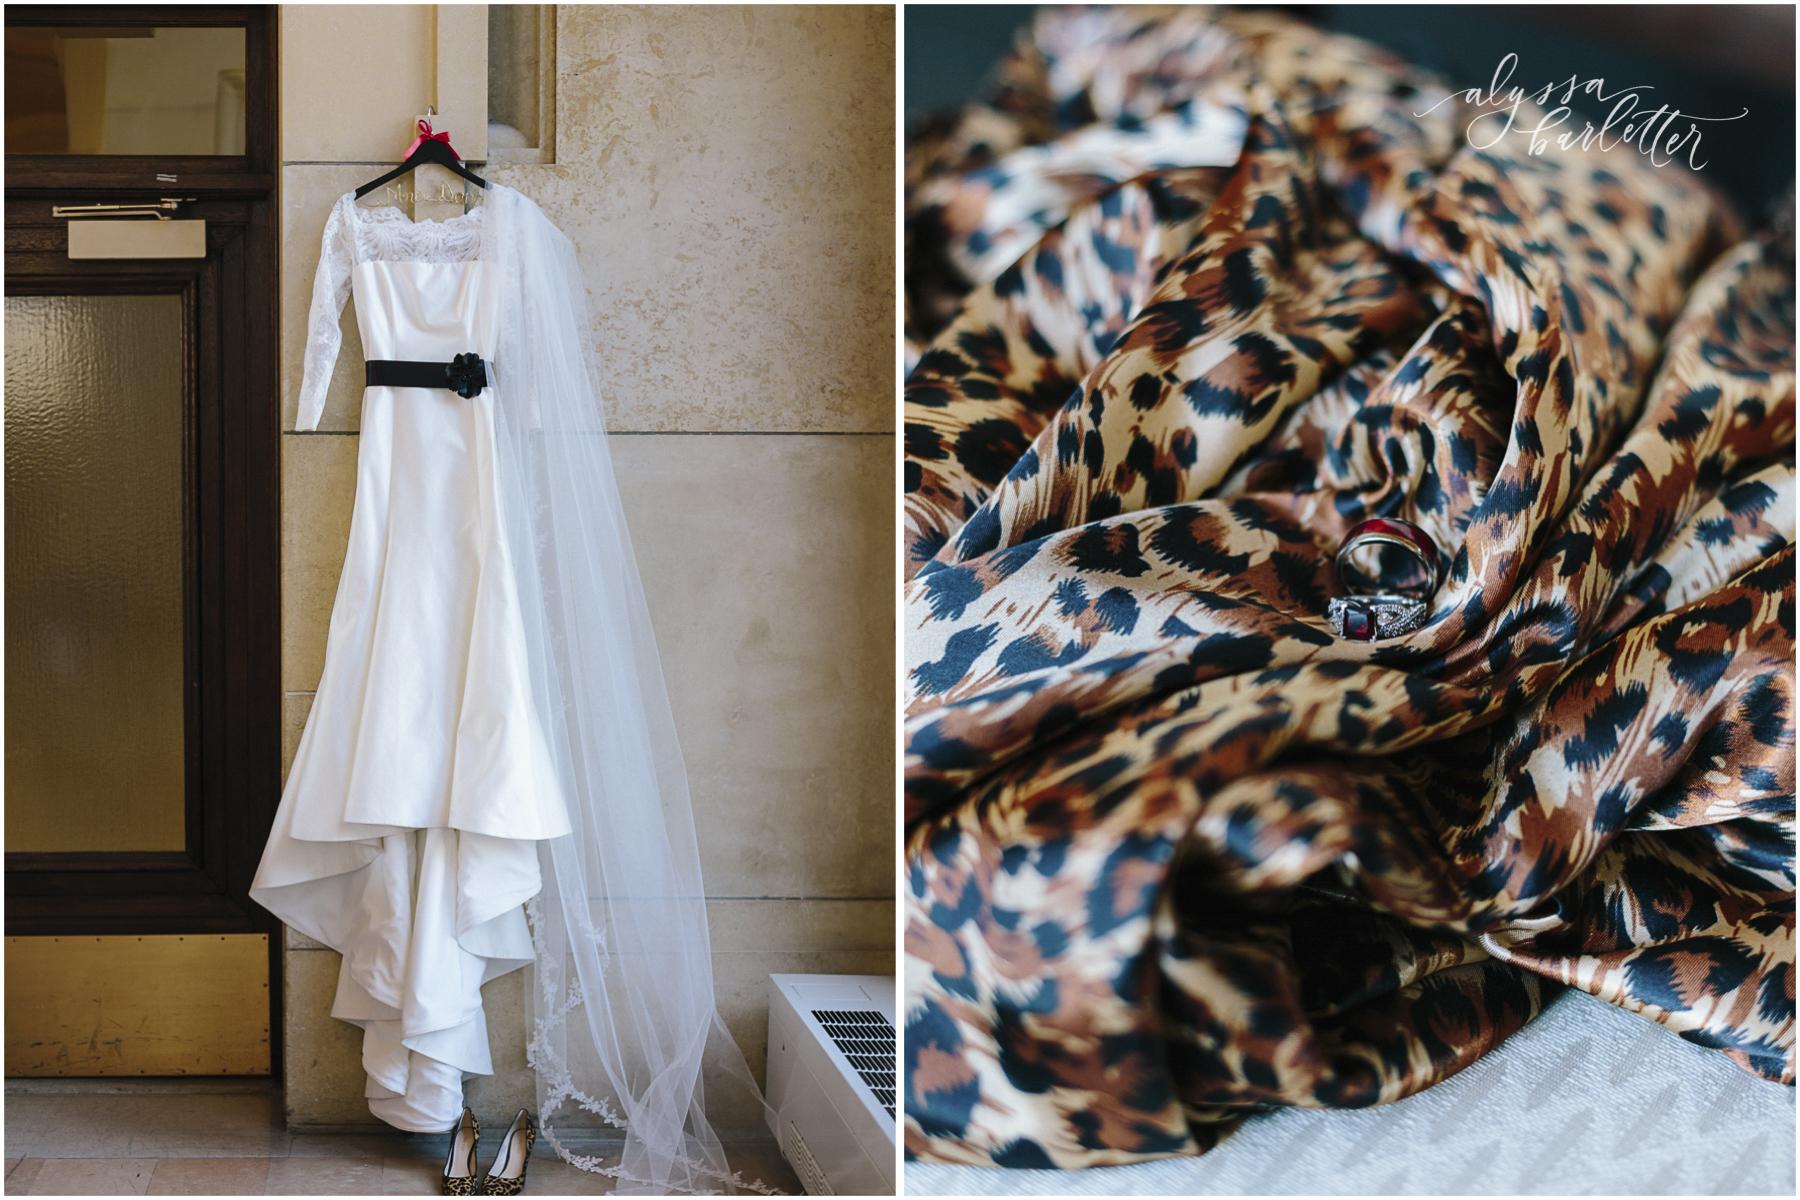 alyssa barletter photography union station wedding photos leopard print winter wedding-1-6.jpg